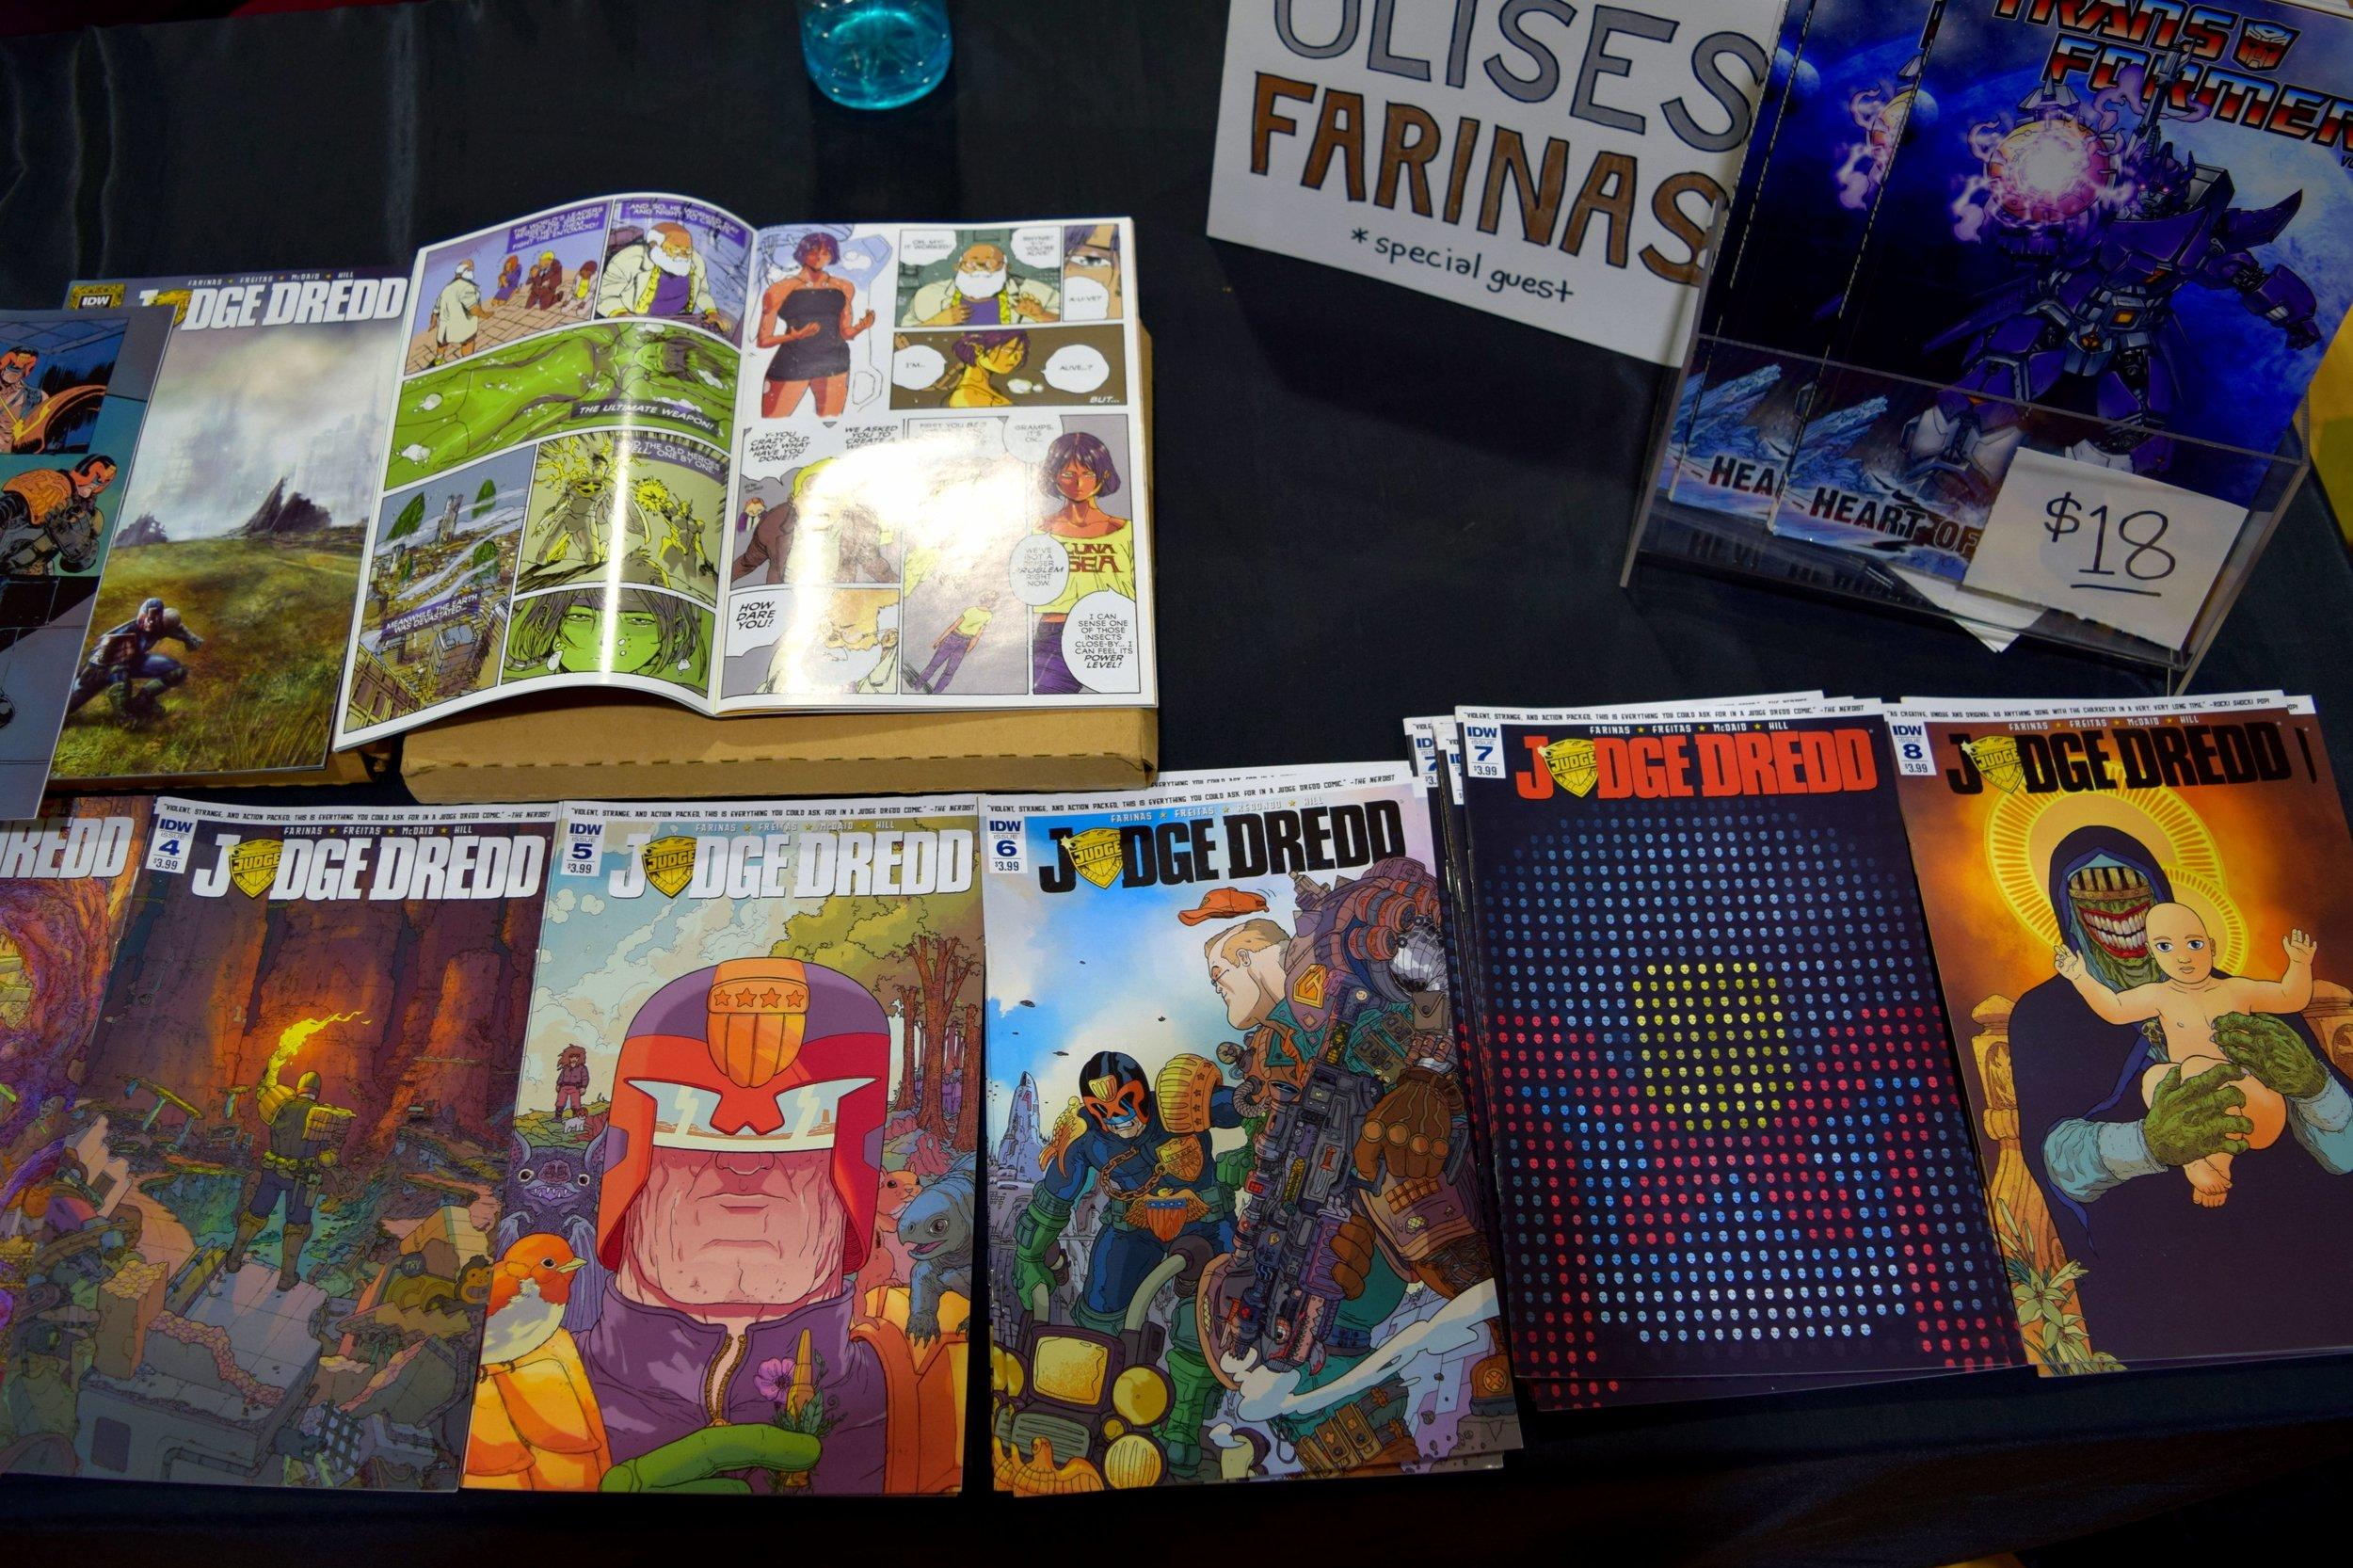 Judge Dredd comics from Ulises Farinas at Fort Collins Comic Con 2016 (2).